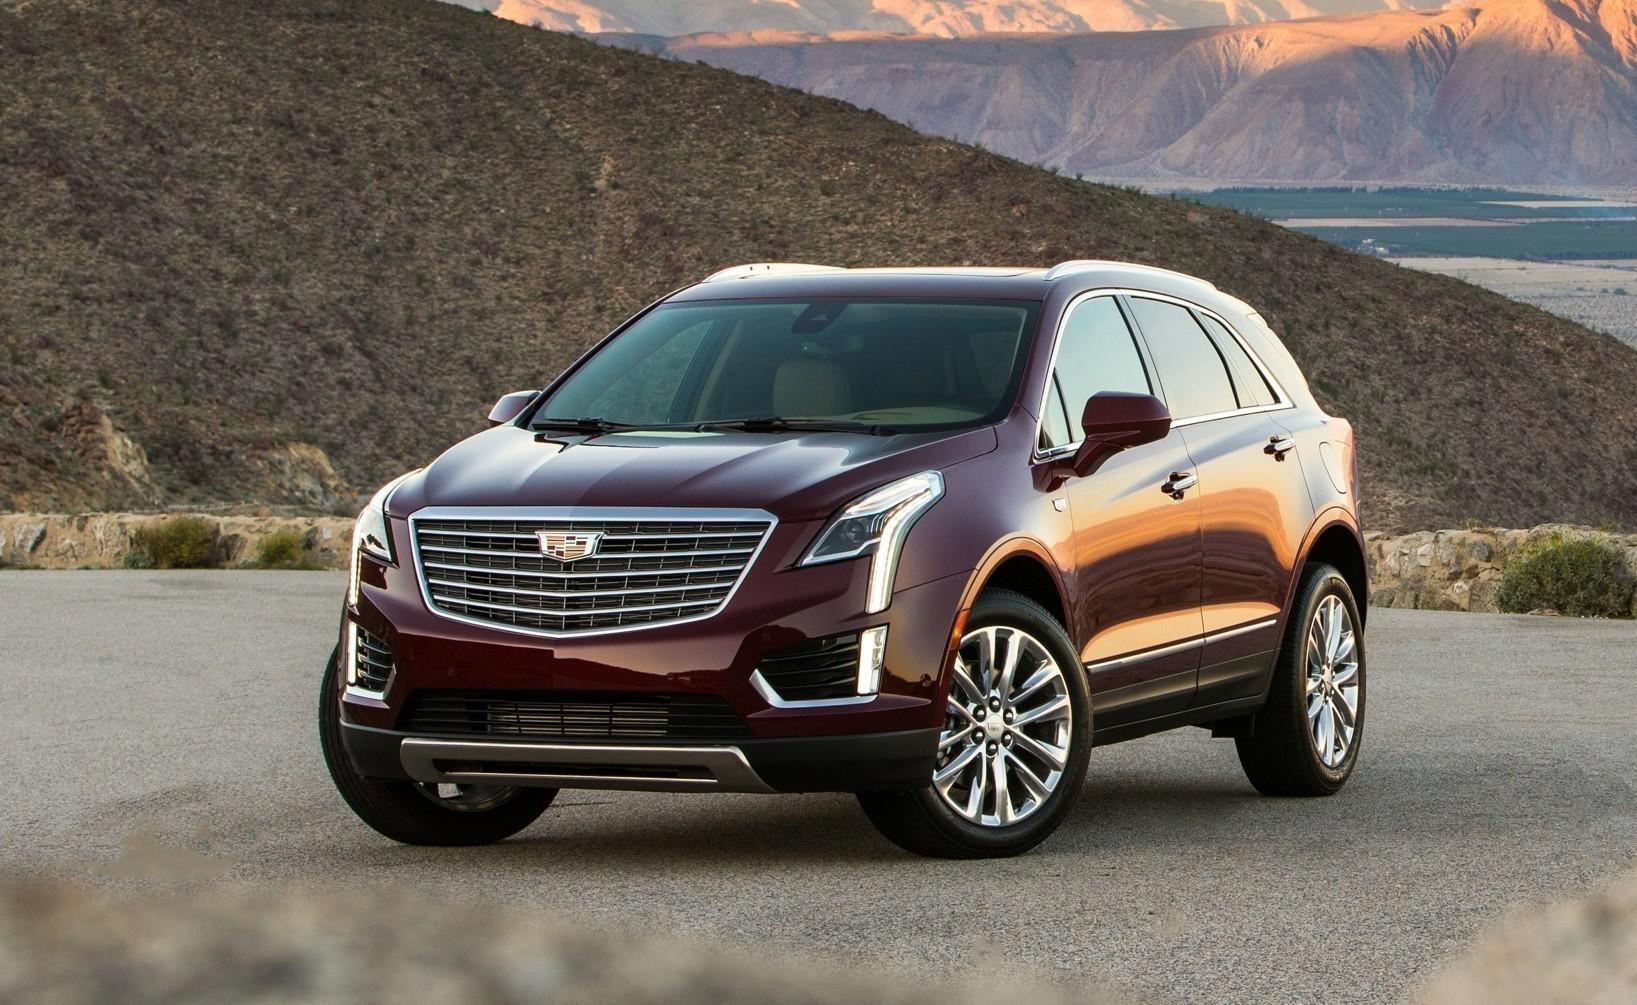 2017 Cadillac XT5 road test - The San Diego Union-Tribune